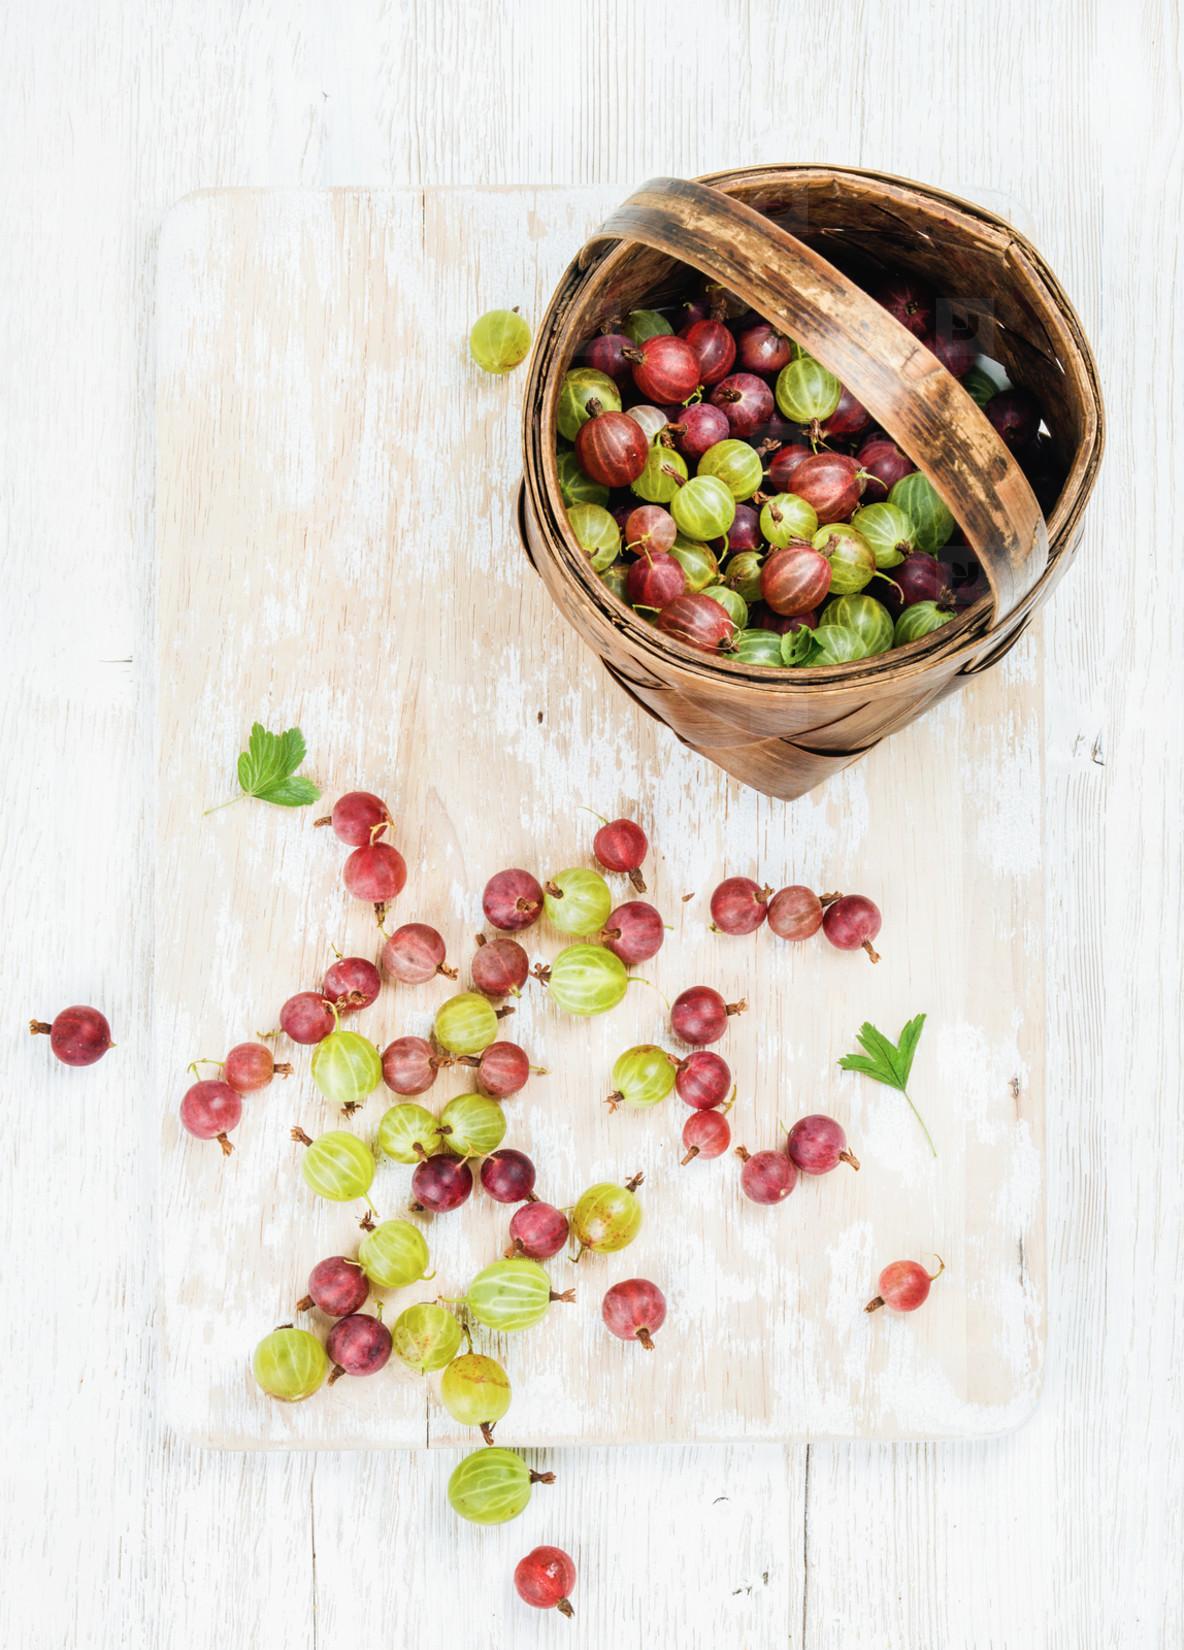 Variety of ripe garden gooseberries in birchbark basket